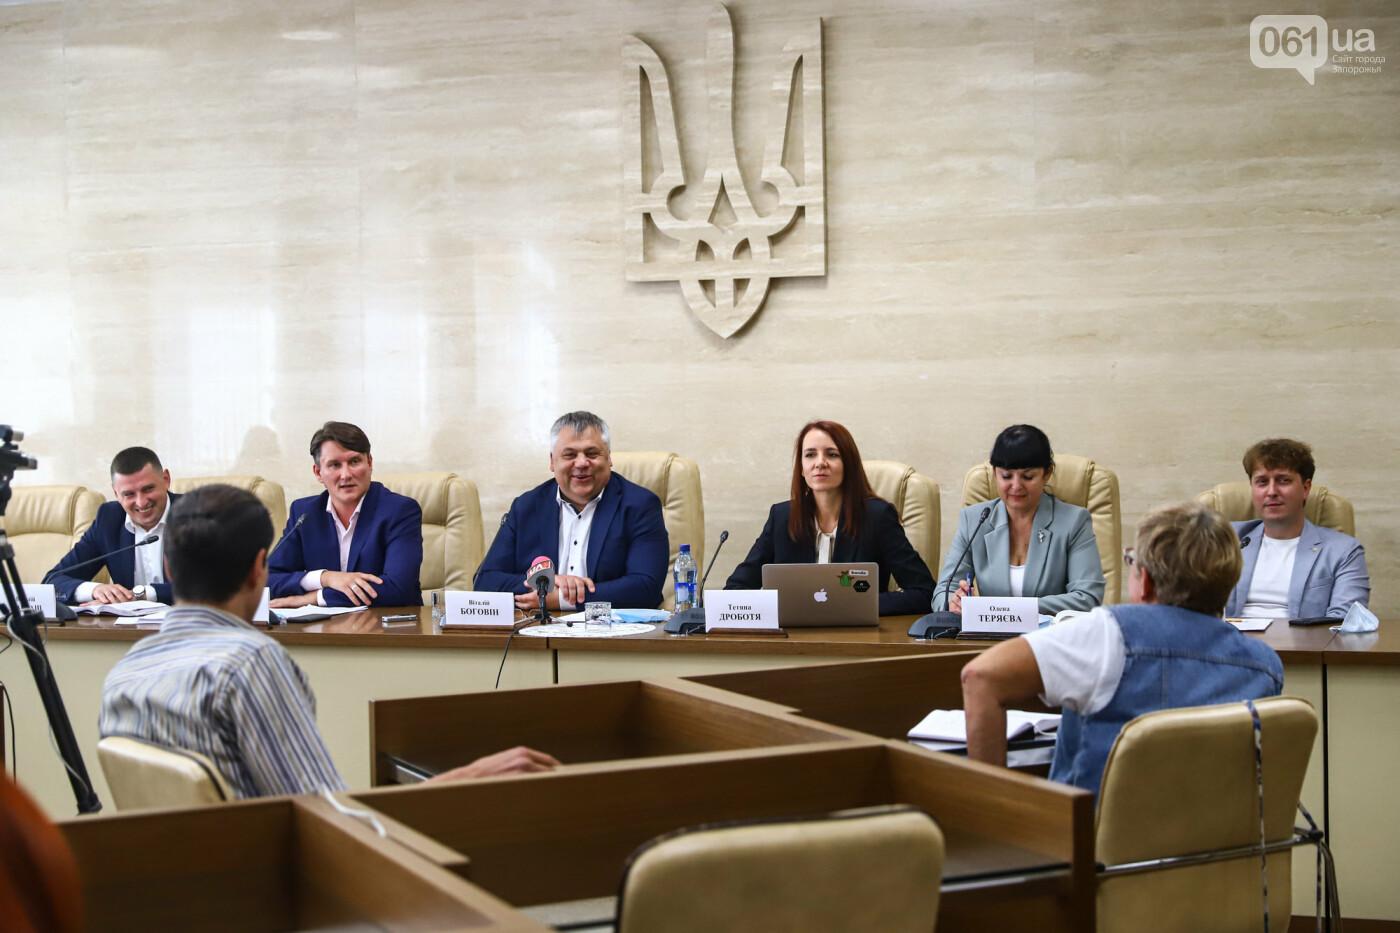 Глава Запорожской ОГА представил команду своих замов, - ФОТО , фото-5